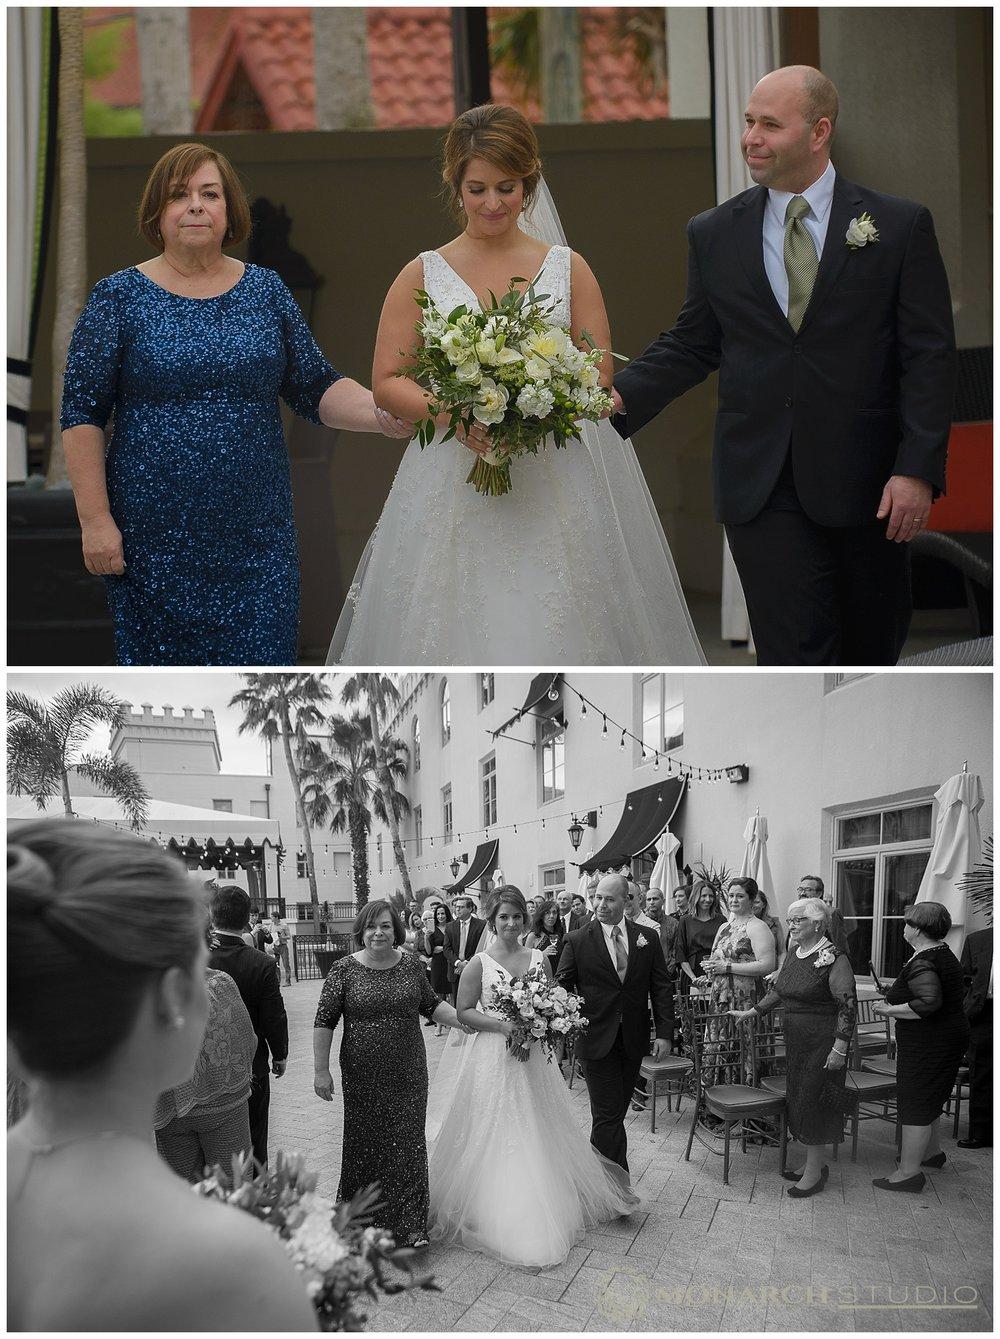 St. Augustine Wedding Photography 024.JPG